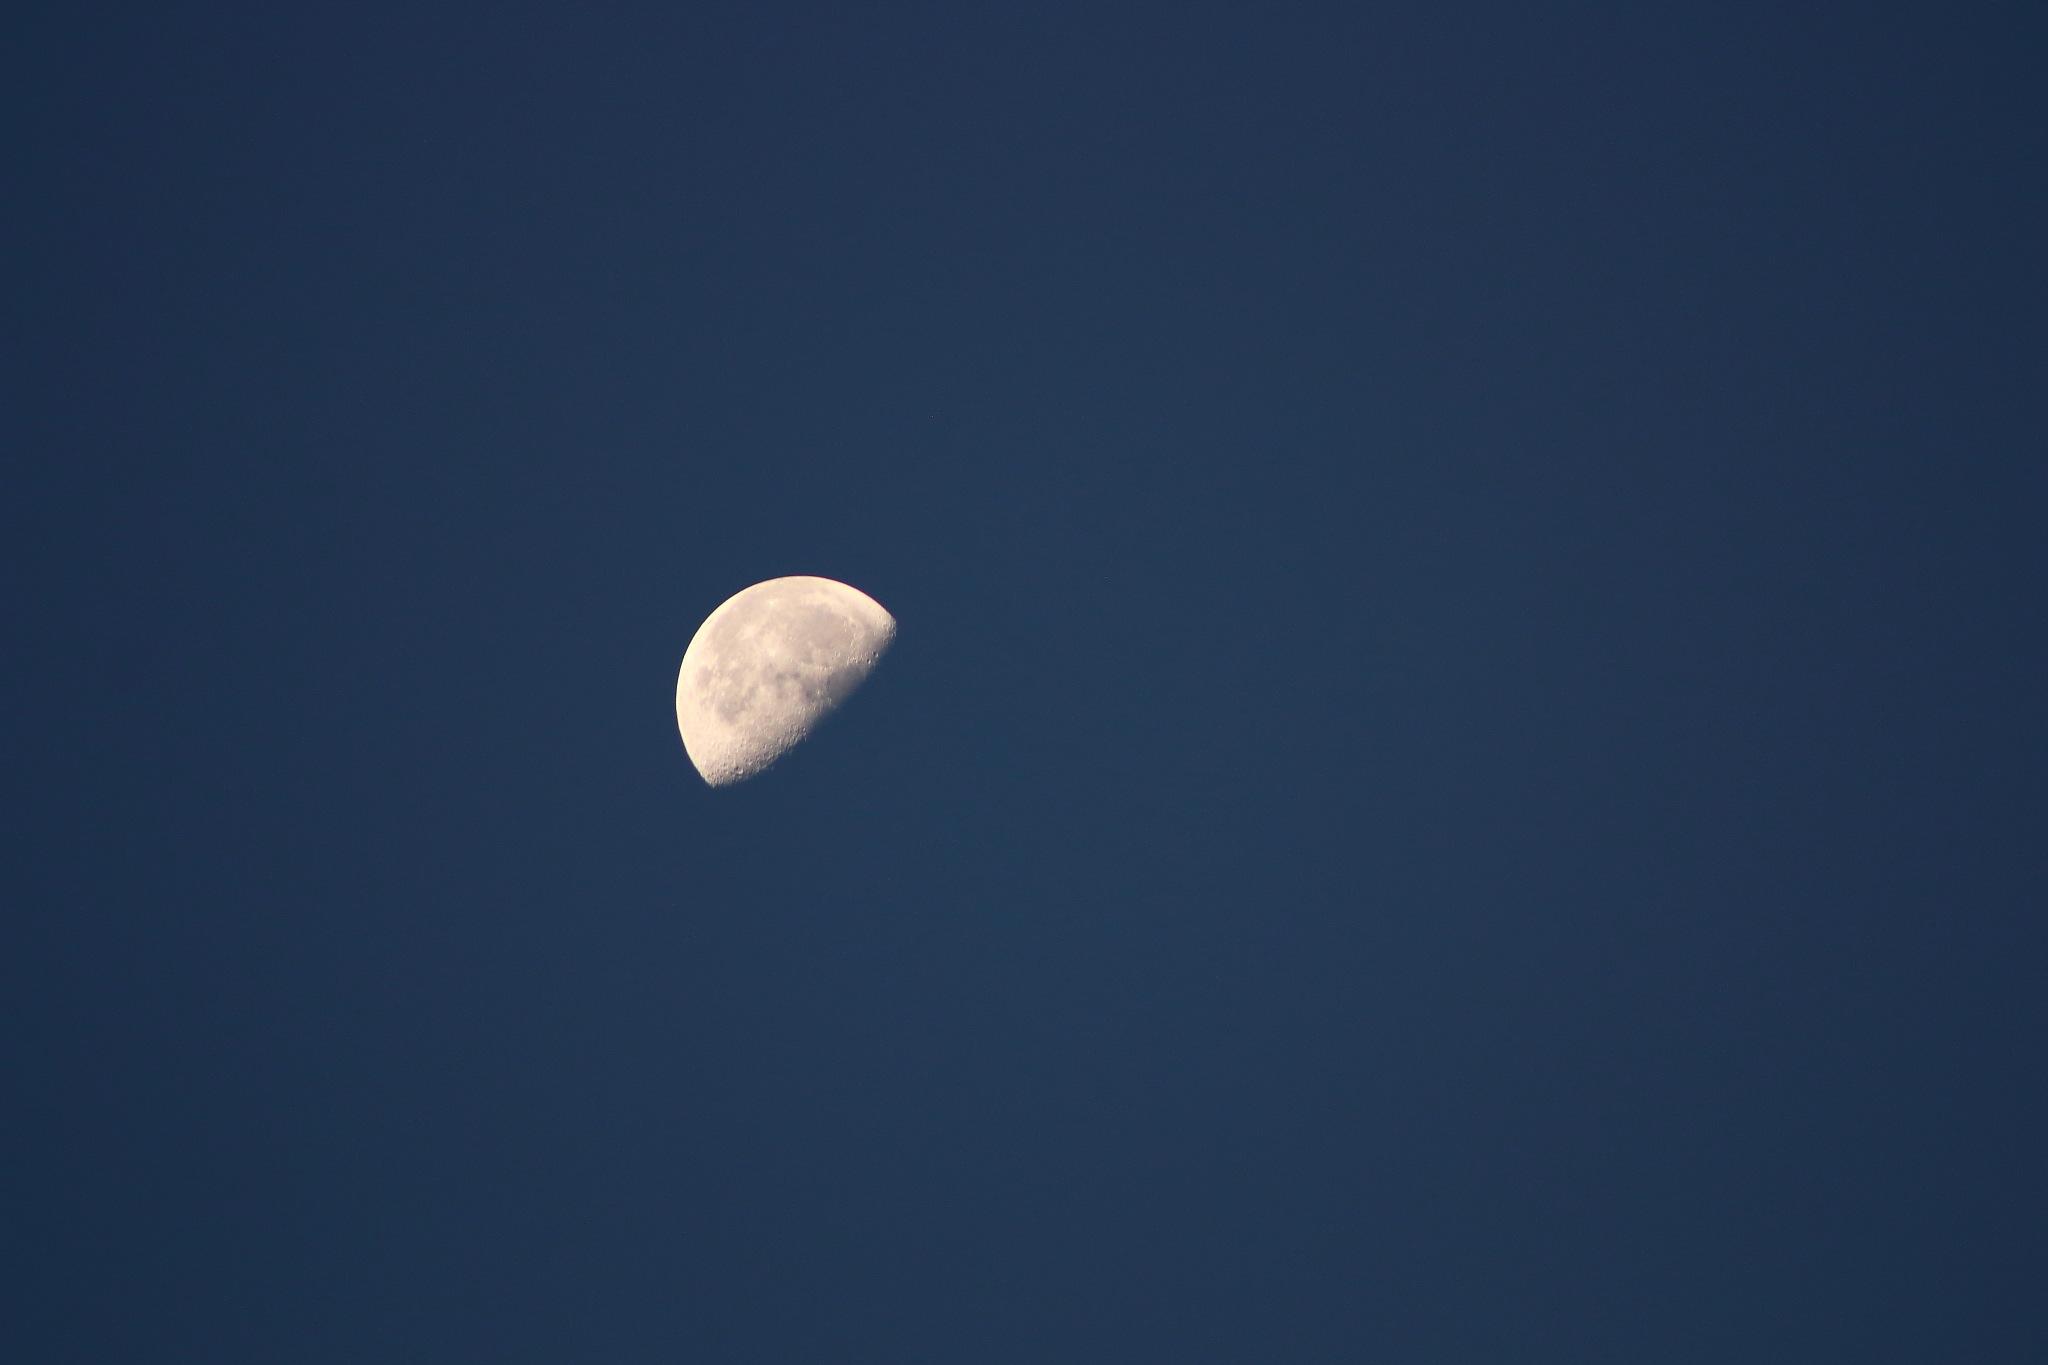 Moon II by Laurie Puglia